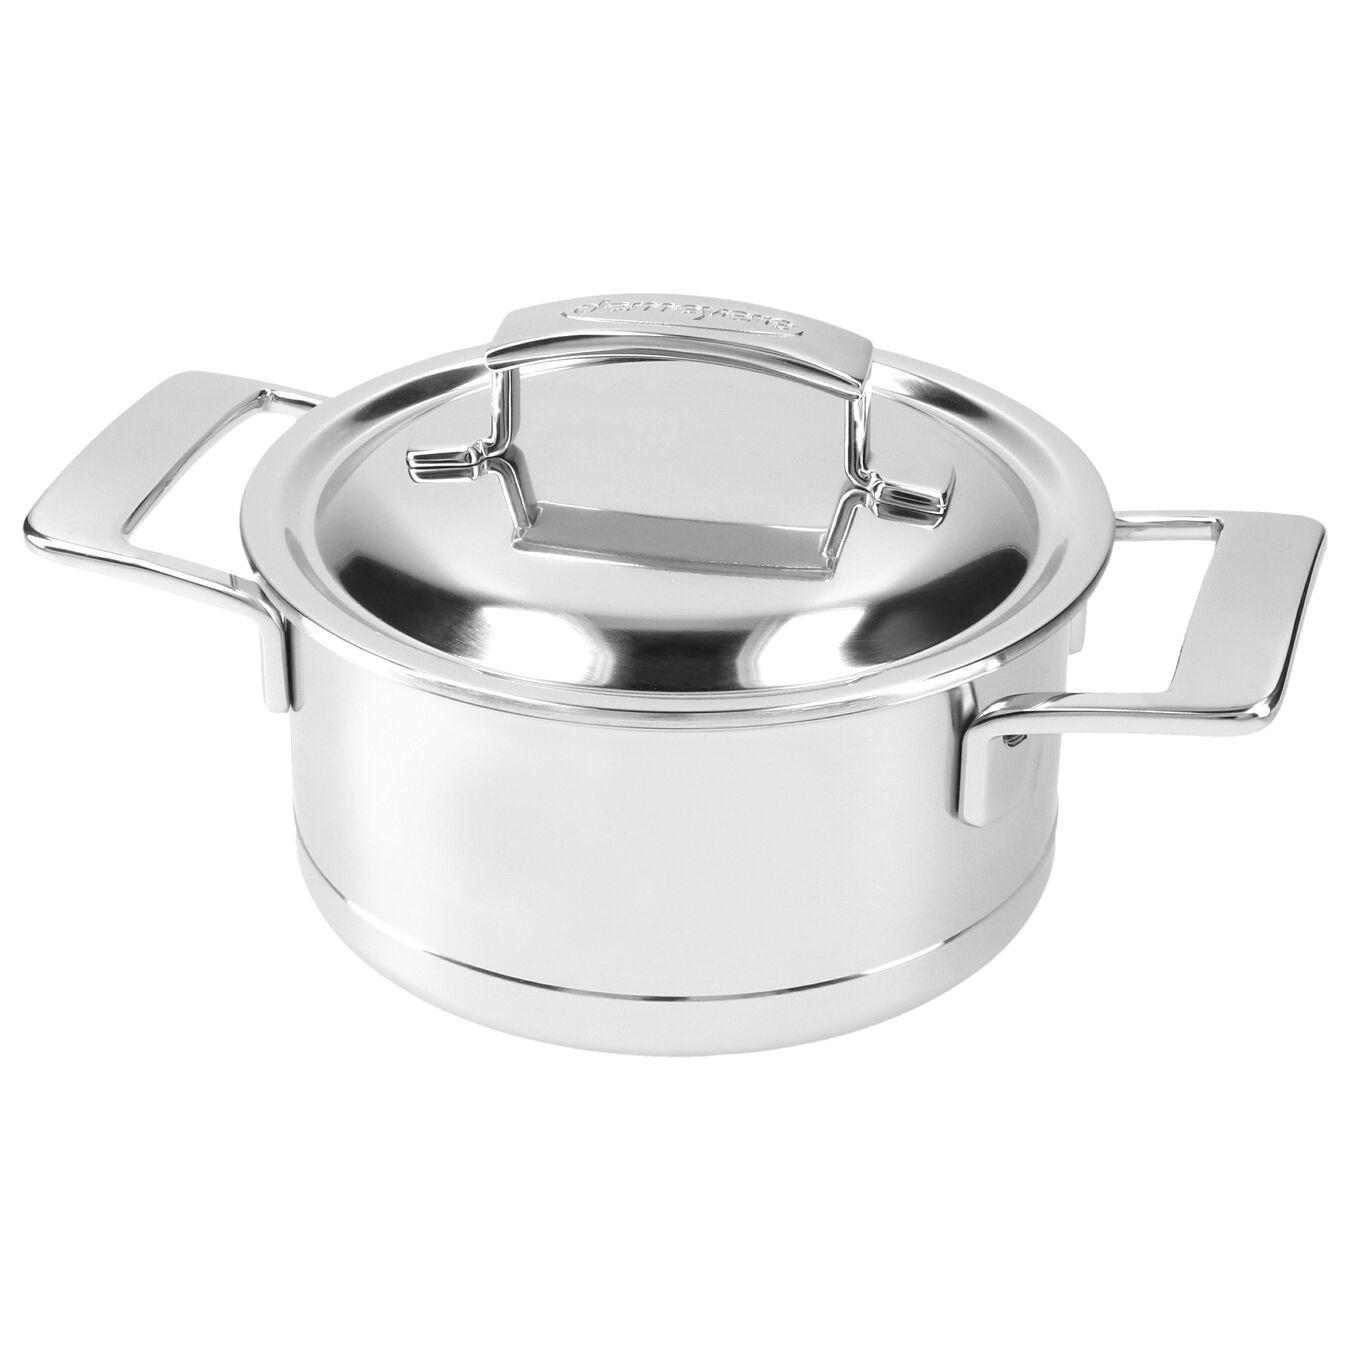 Kookpot met dubbelwandig deksel 16 cm / 1,5 l,,large 6